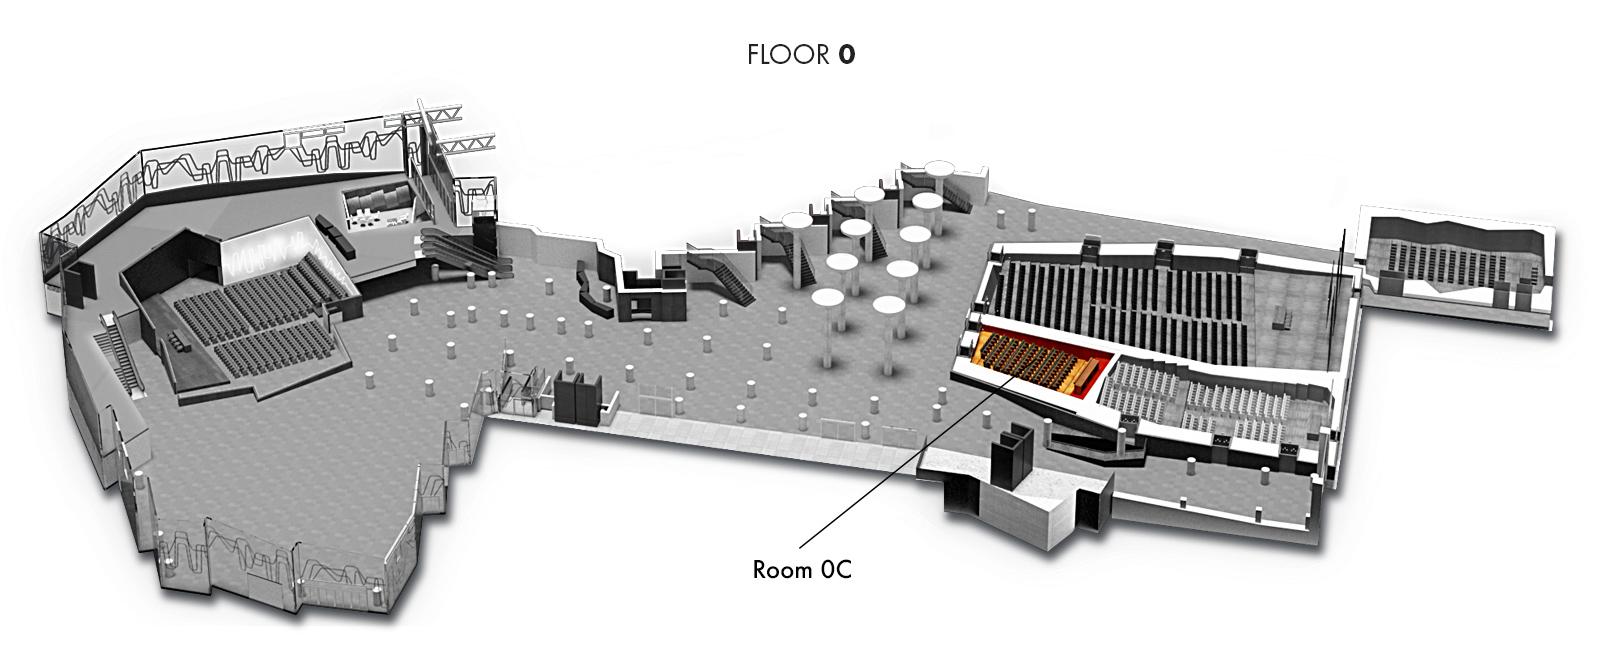 Room 0C, Floor 0   Palacio Euskalduna Jauregia